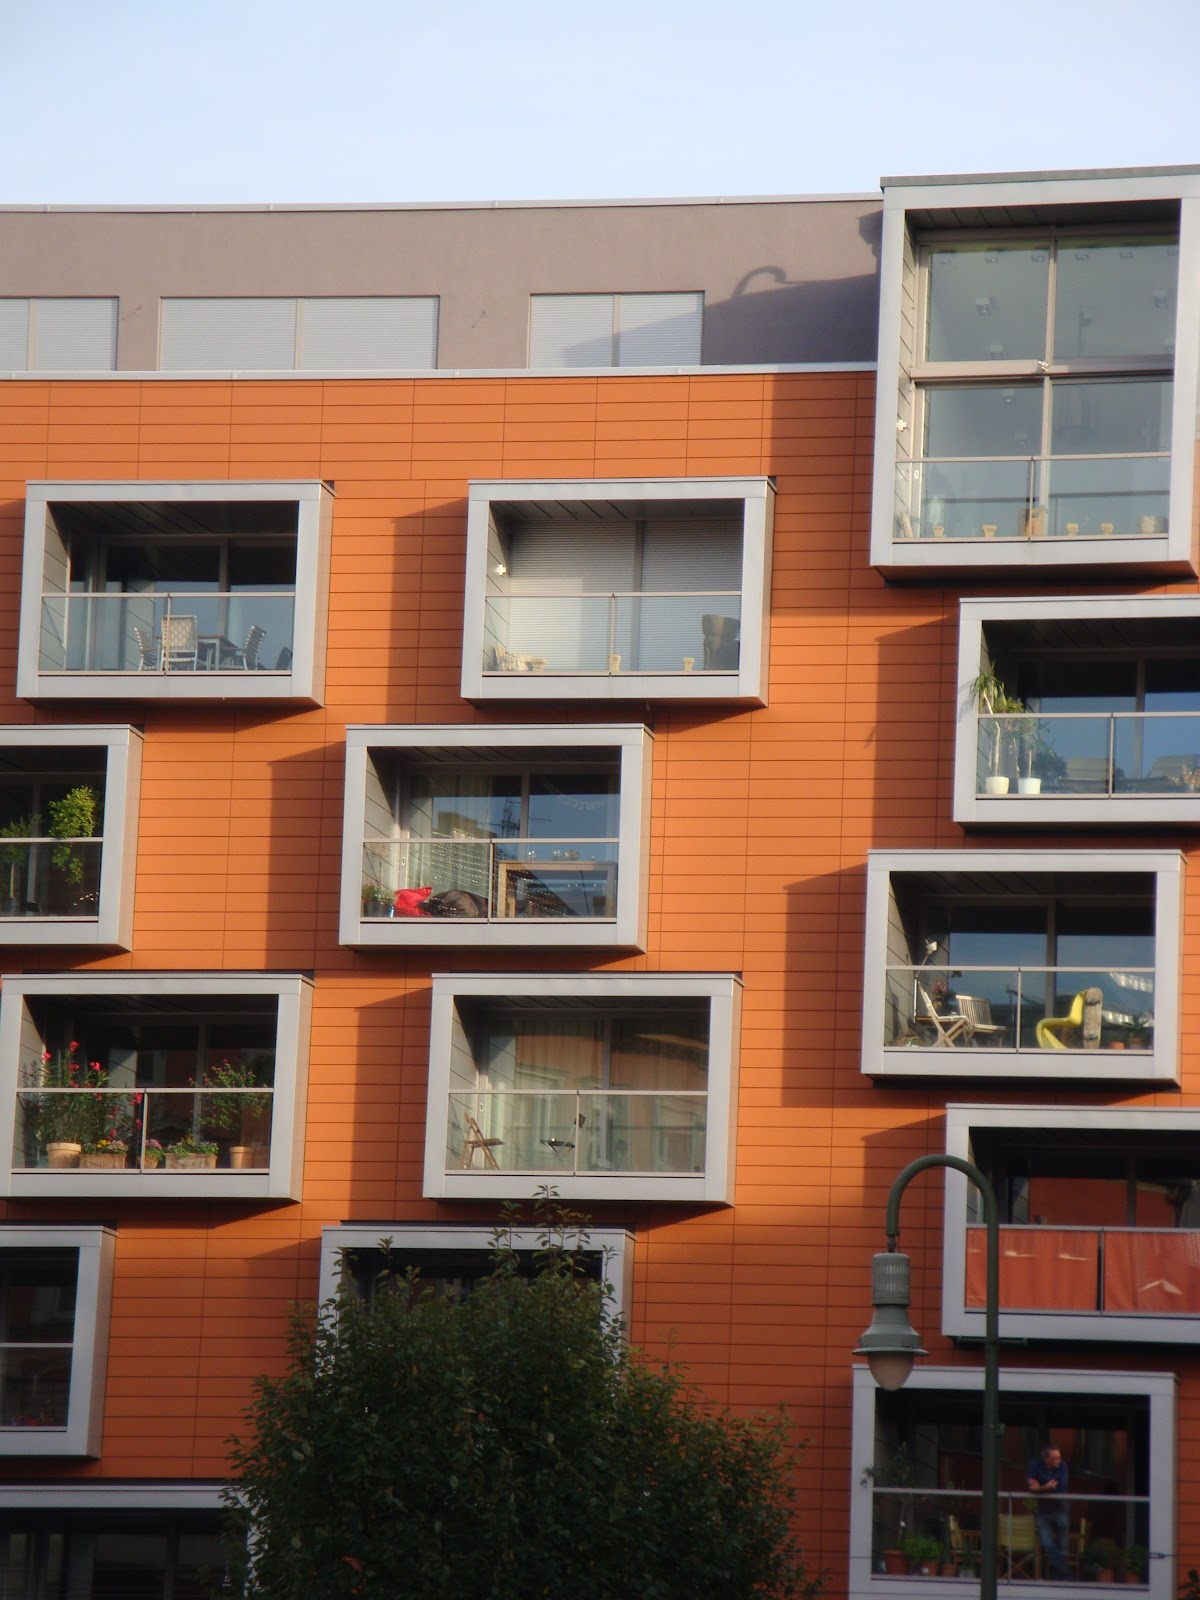 Berlin architecture in photos berlin explorer for Box window design